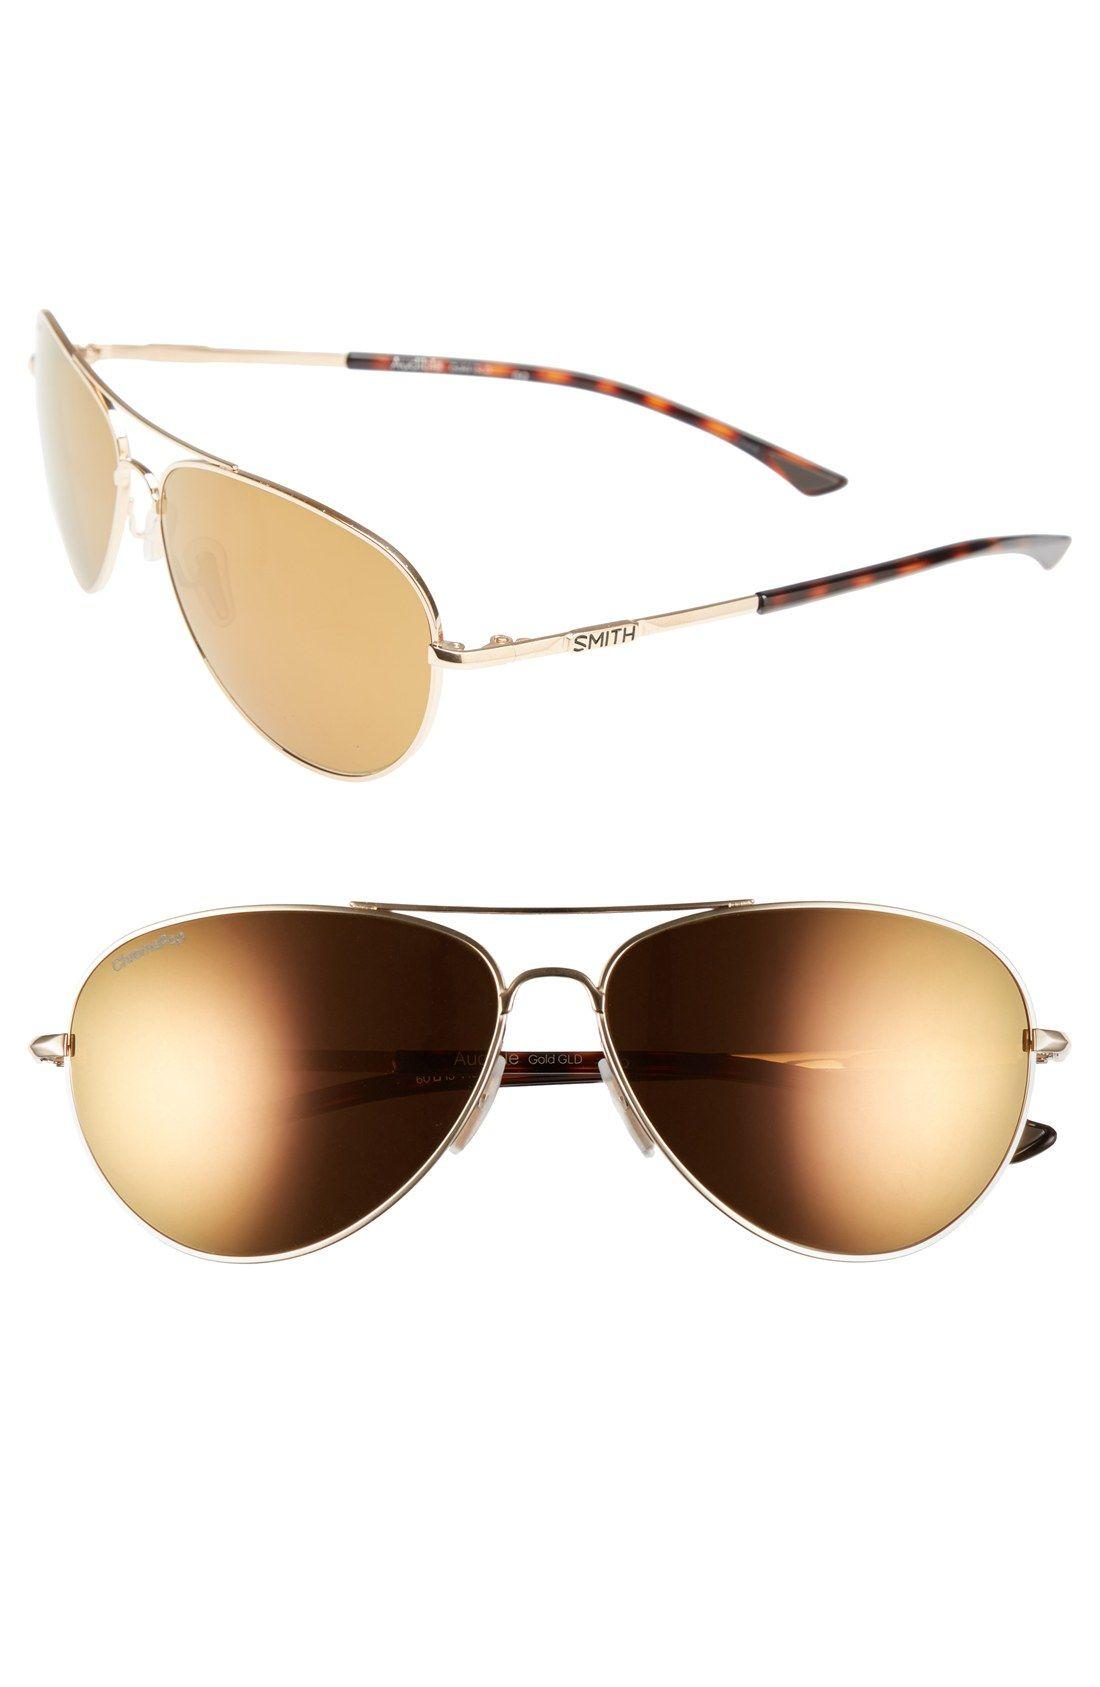 decfcf3f01 Smith Optics  Audible - ChromaPop  60mm Polarized Aviator Sunglasses ...